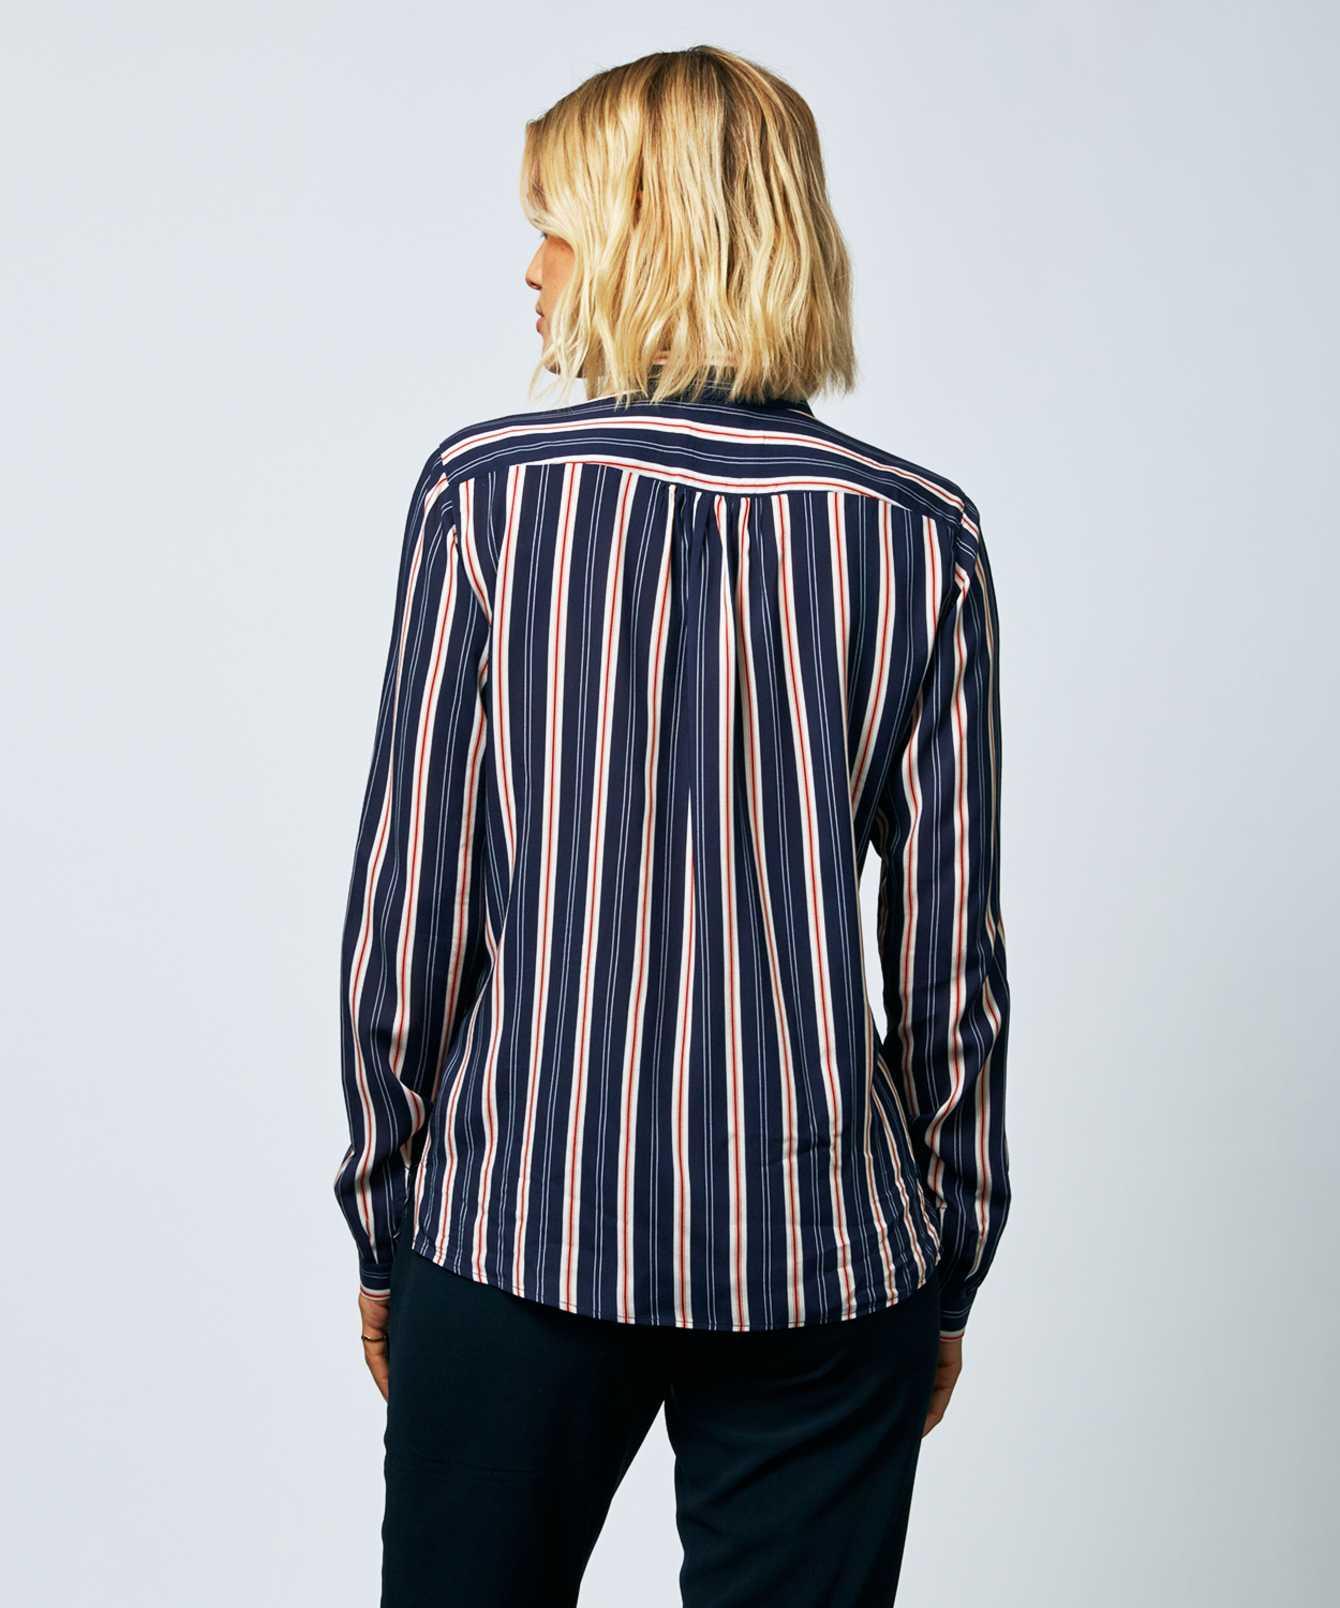 Skjorta Gina Leksand The Shirt Factory